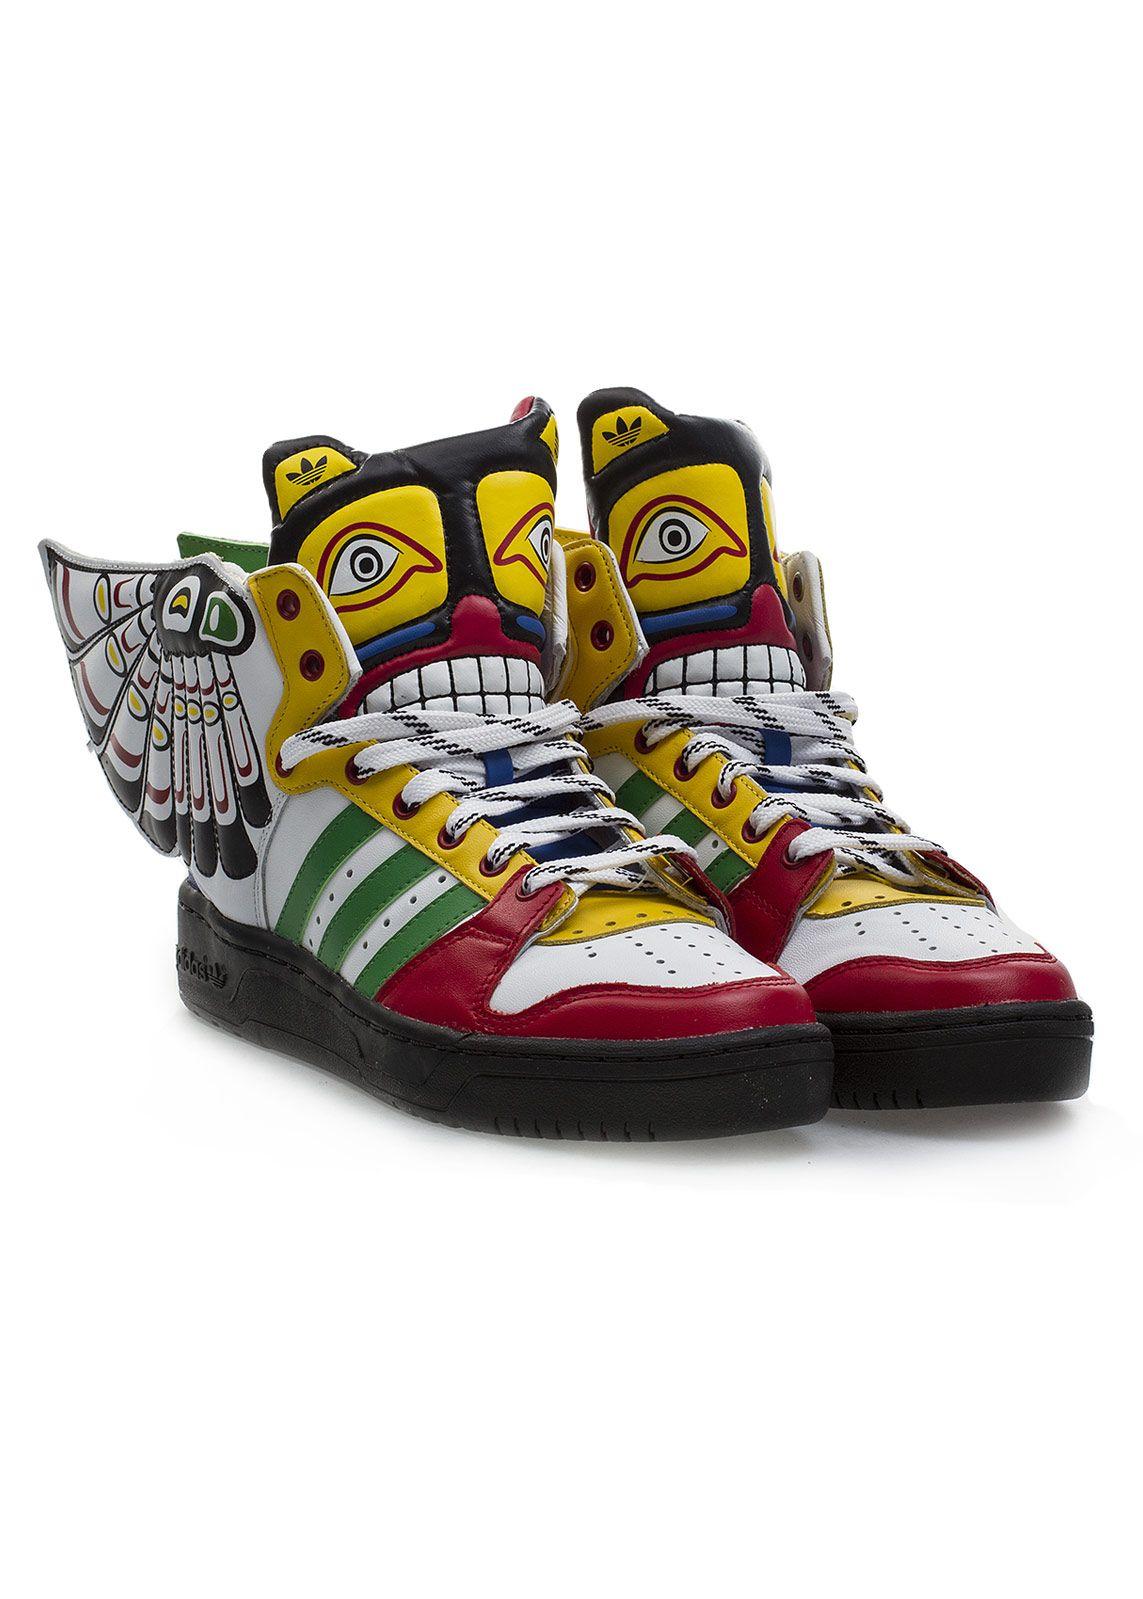 Adidas Originals Sportowe Buty Sportowe Adidas Originals By Jeremy Scott Eagle Wing Jeremy Scott Adidas Crazy Shoes Adidas